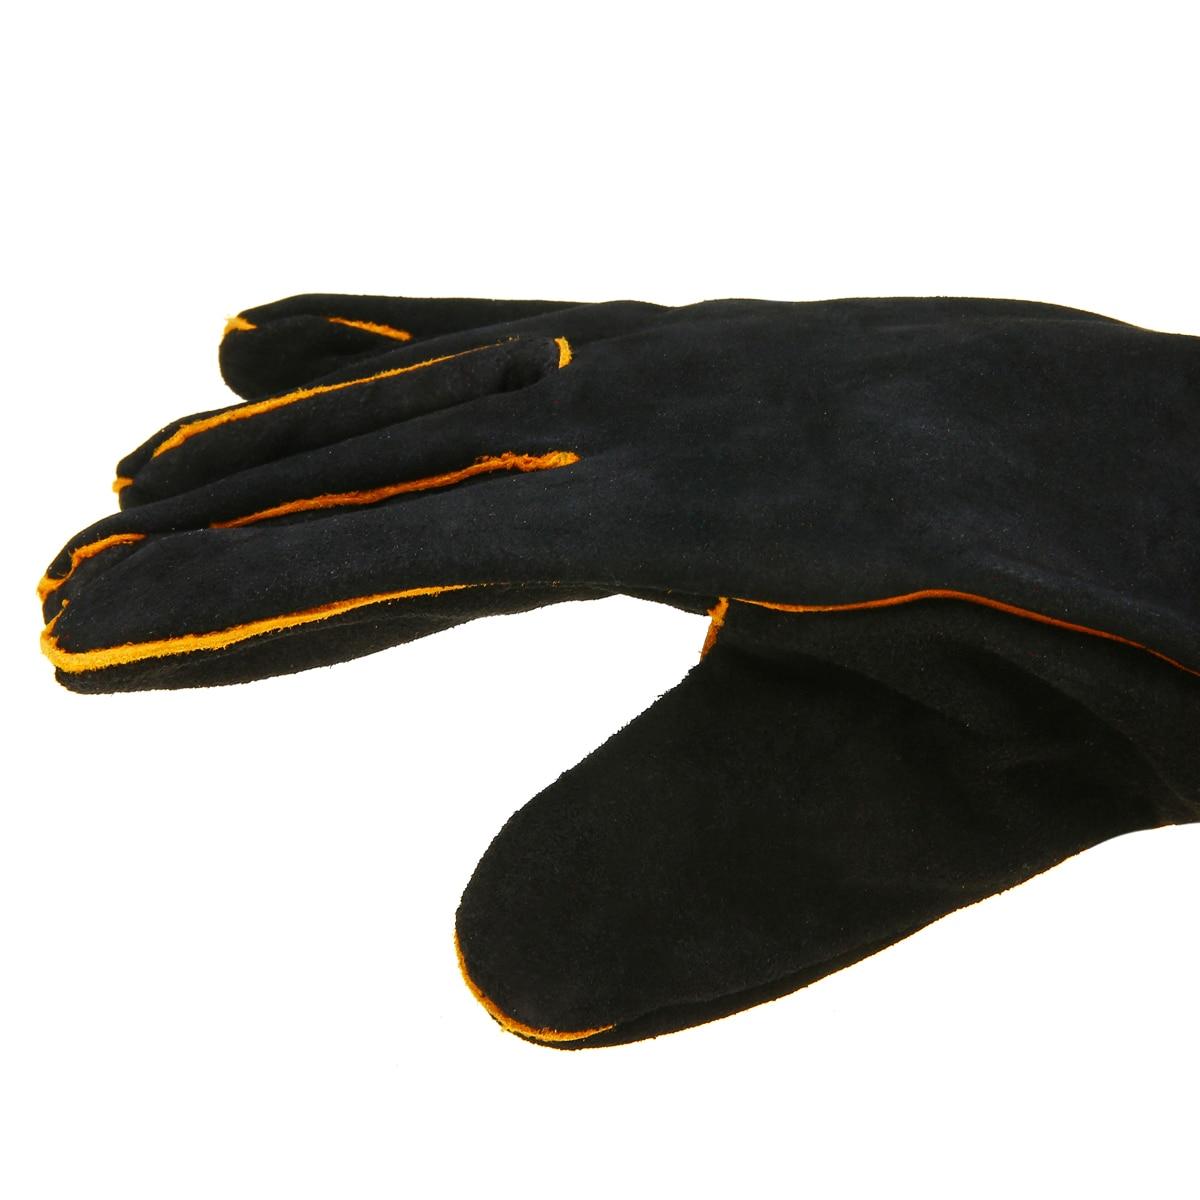 1 Pair Heavy Duty Welding Gloves Cowhide Black Mig Welding Gauntlets Welders Leather Gloves Heat-resistant Protection